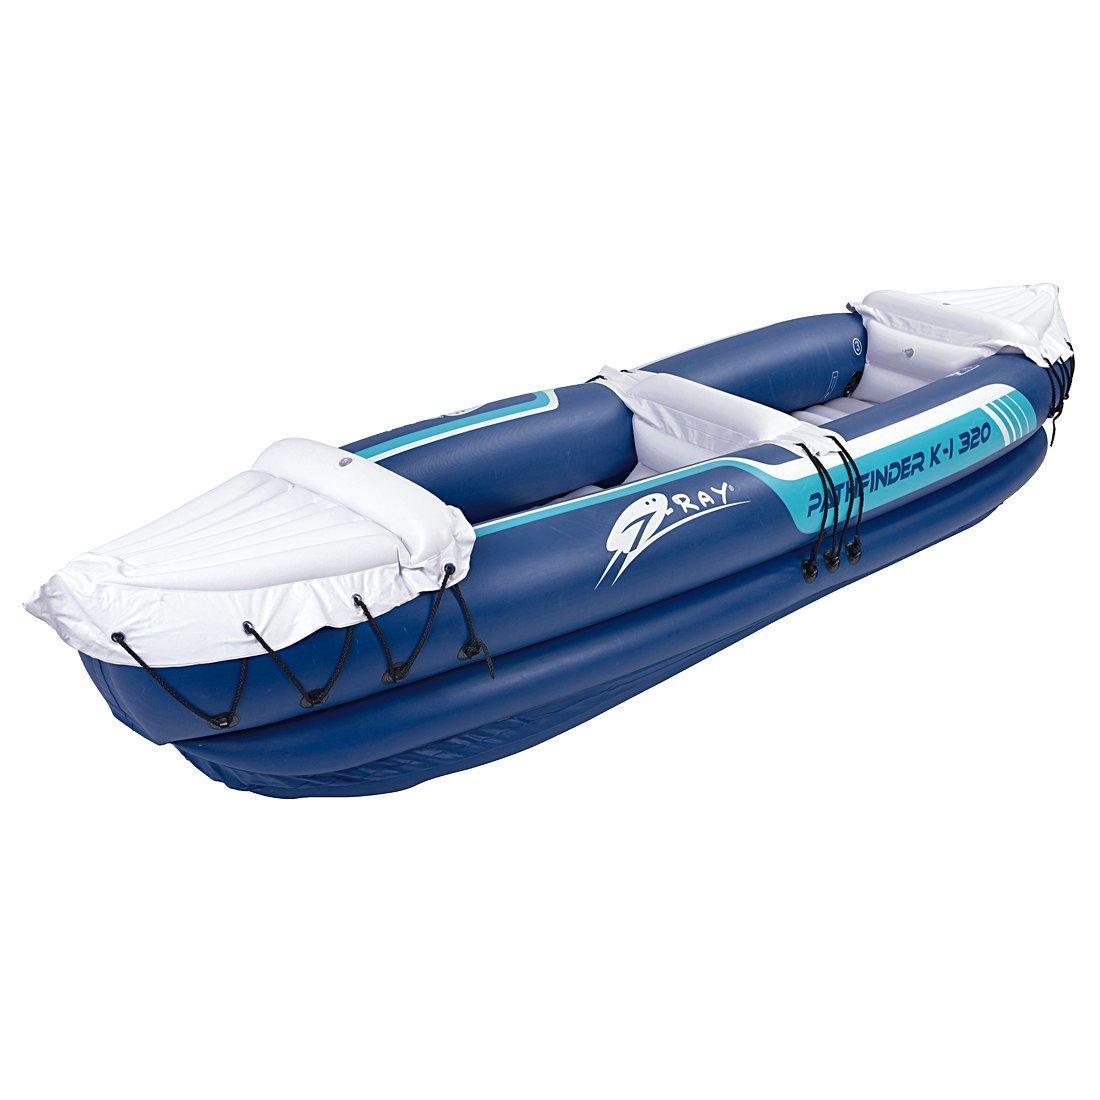 JILONG Kajak K-I Pathfinder - Kayak Hinchable, Talla única ...